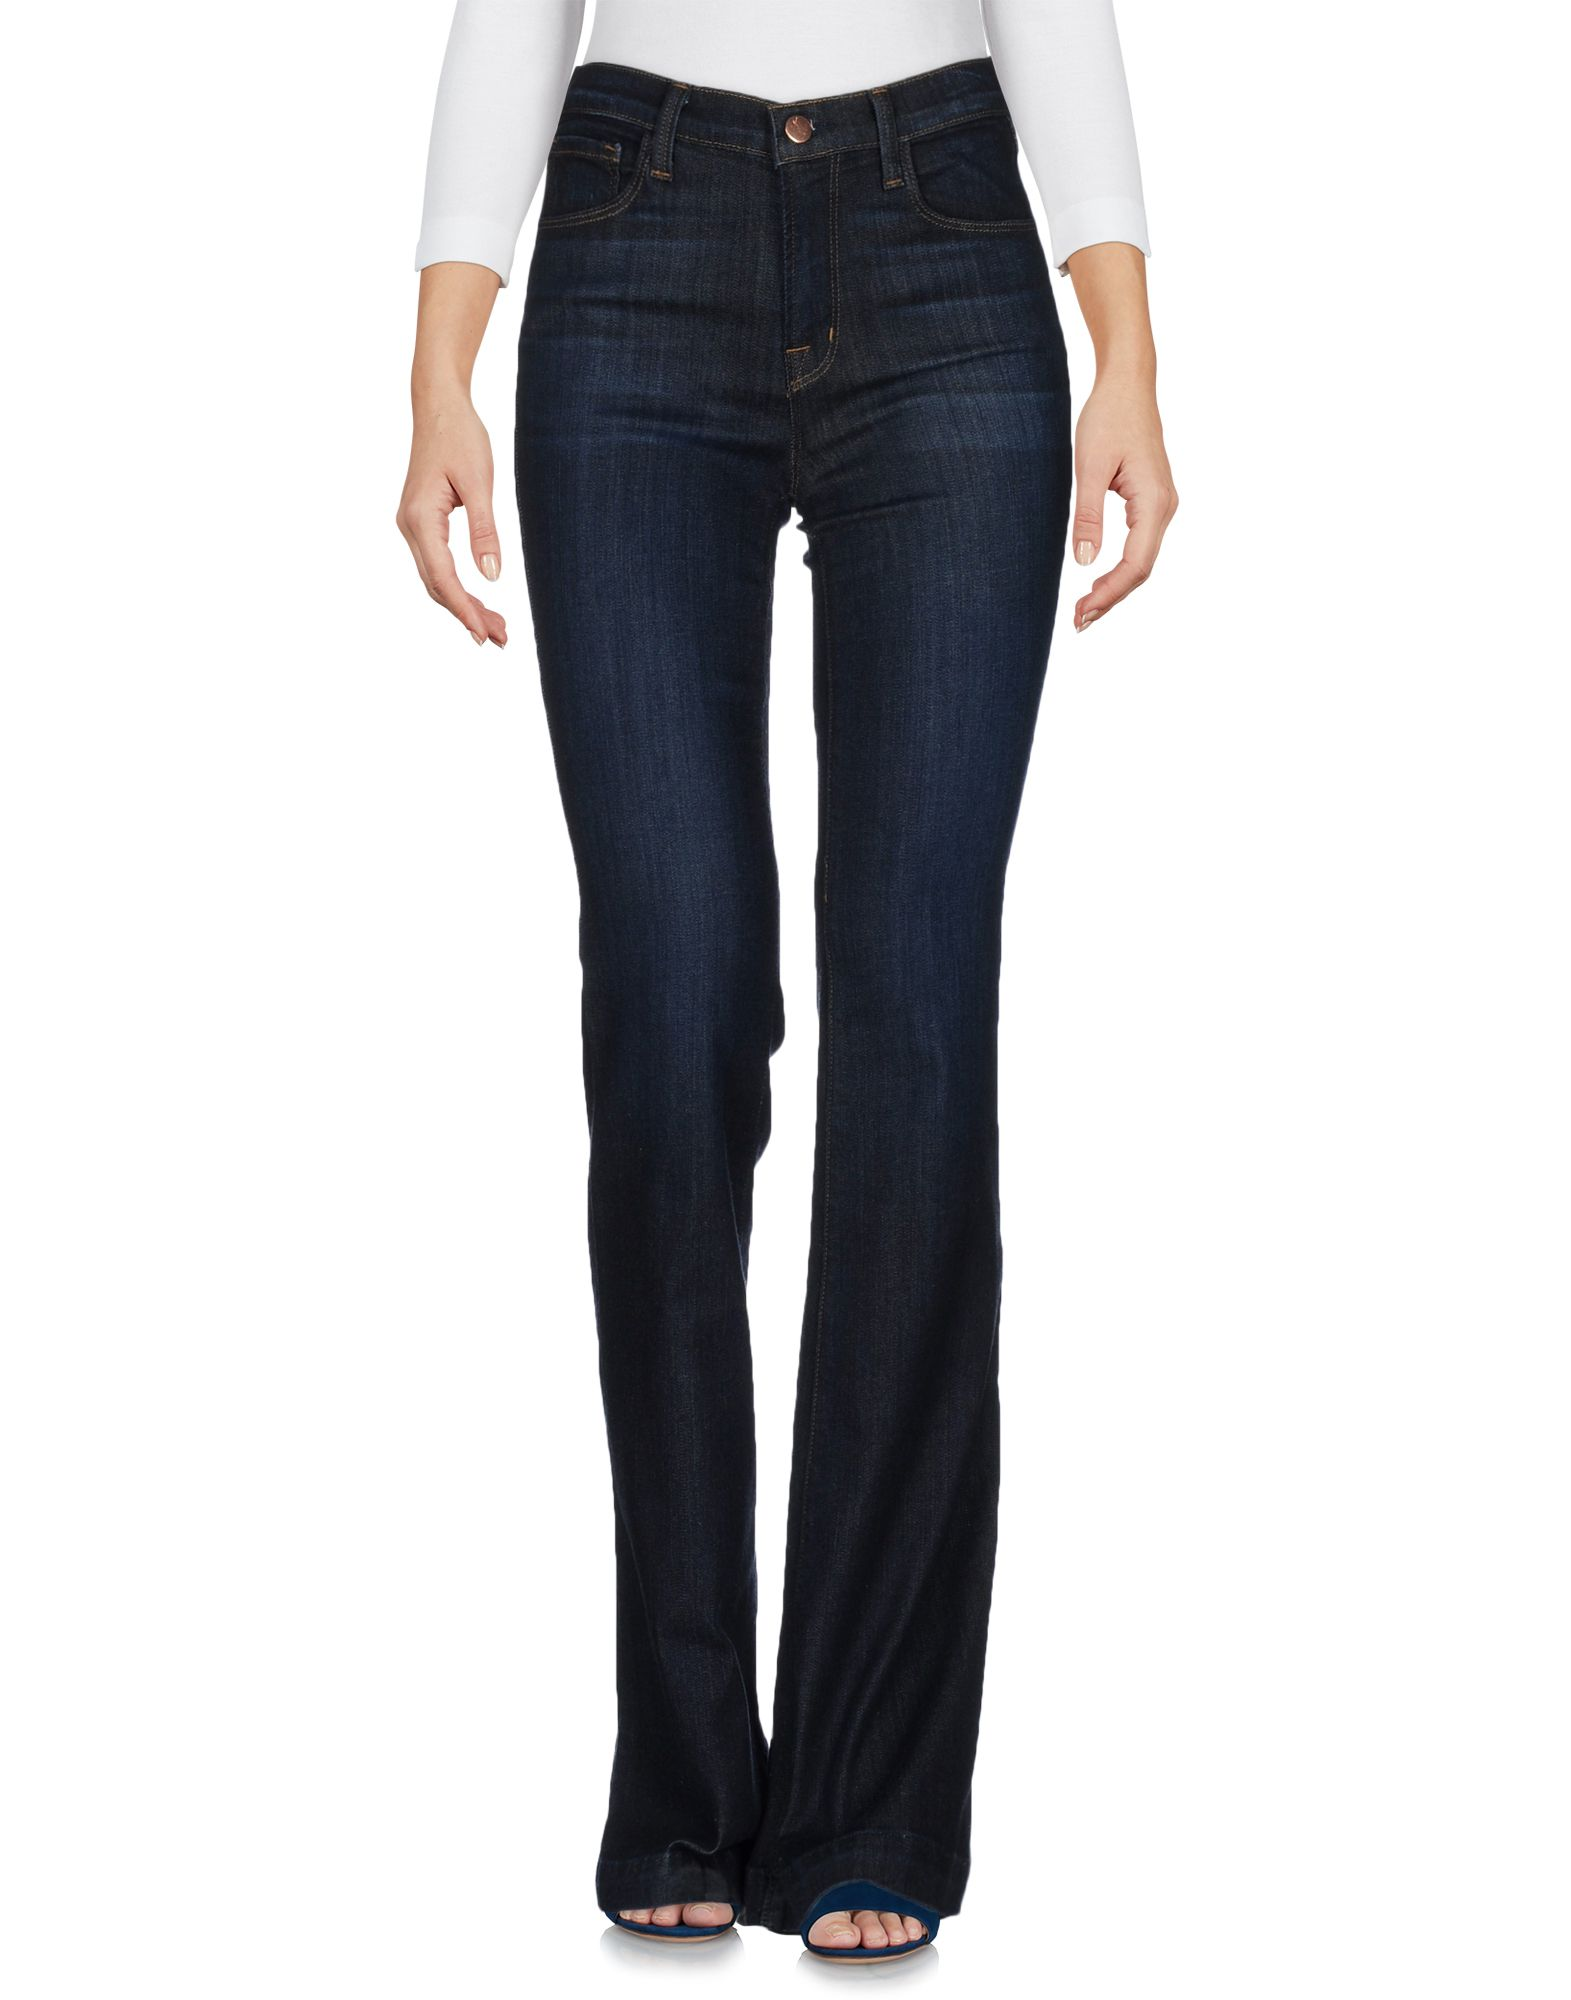 Pantaloni Jeans J Brand Donna - Acquista online su H4P5lGLF